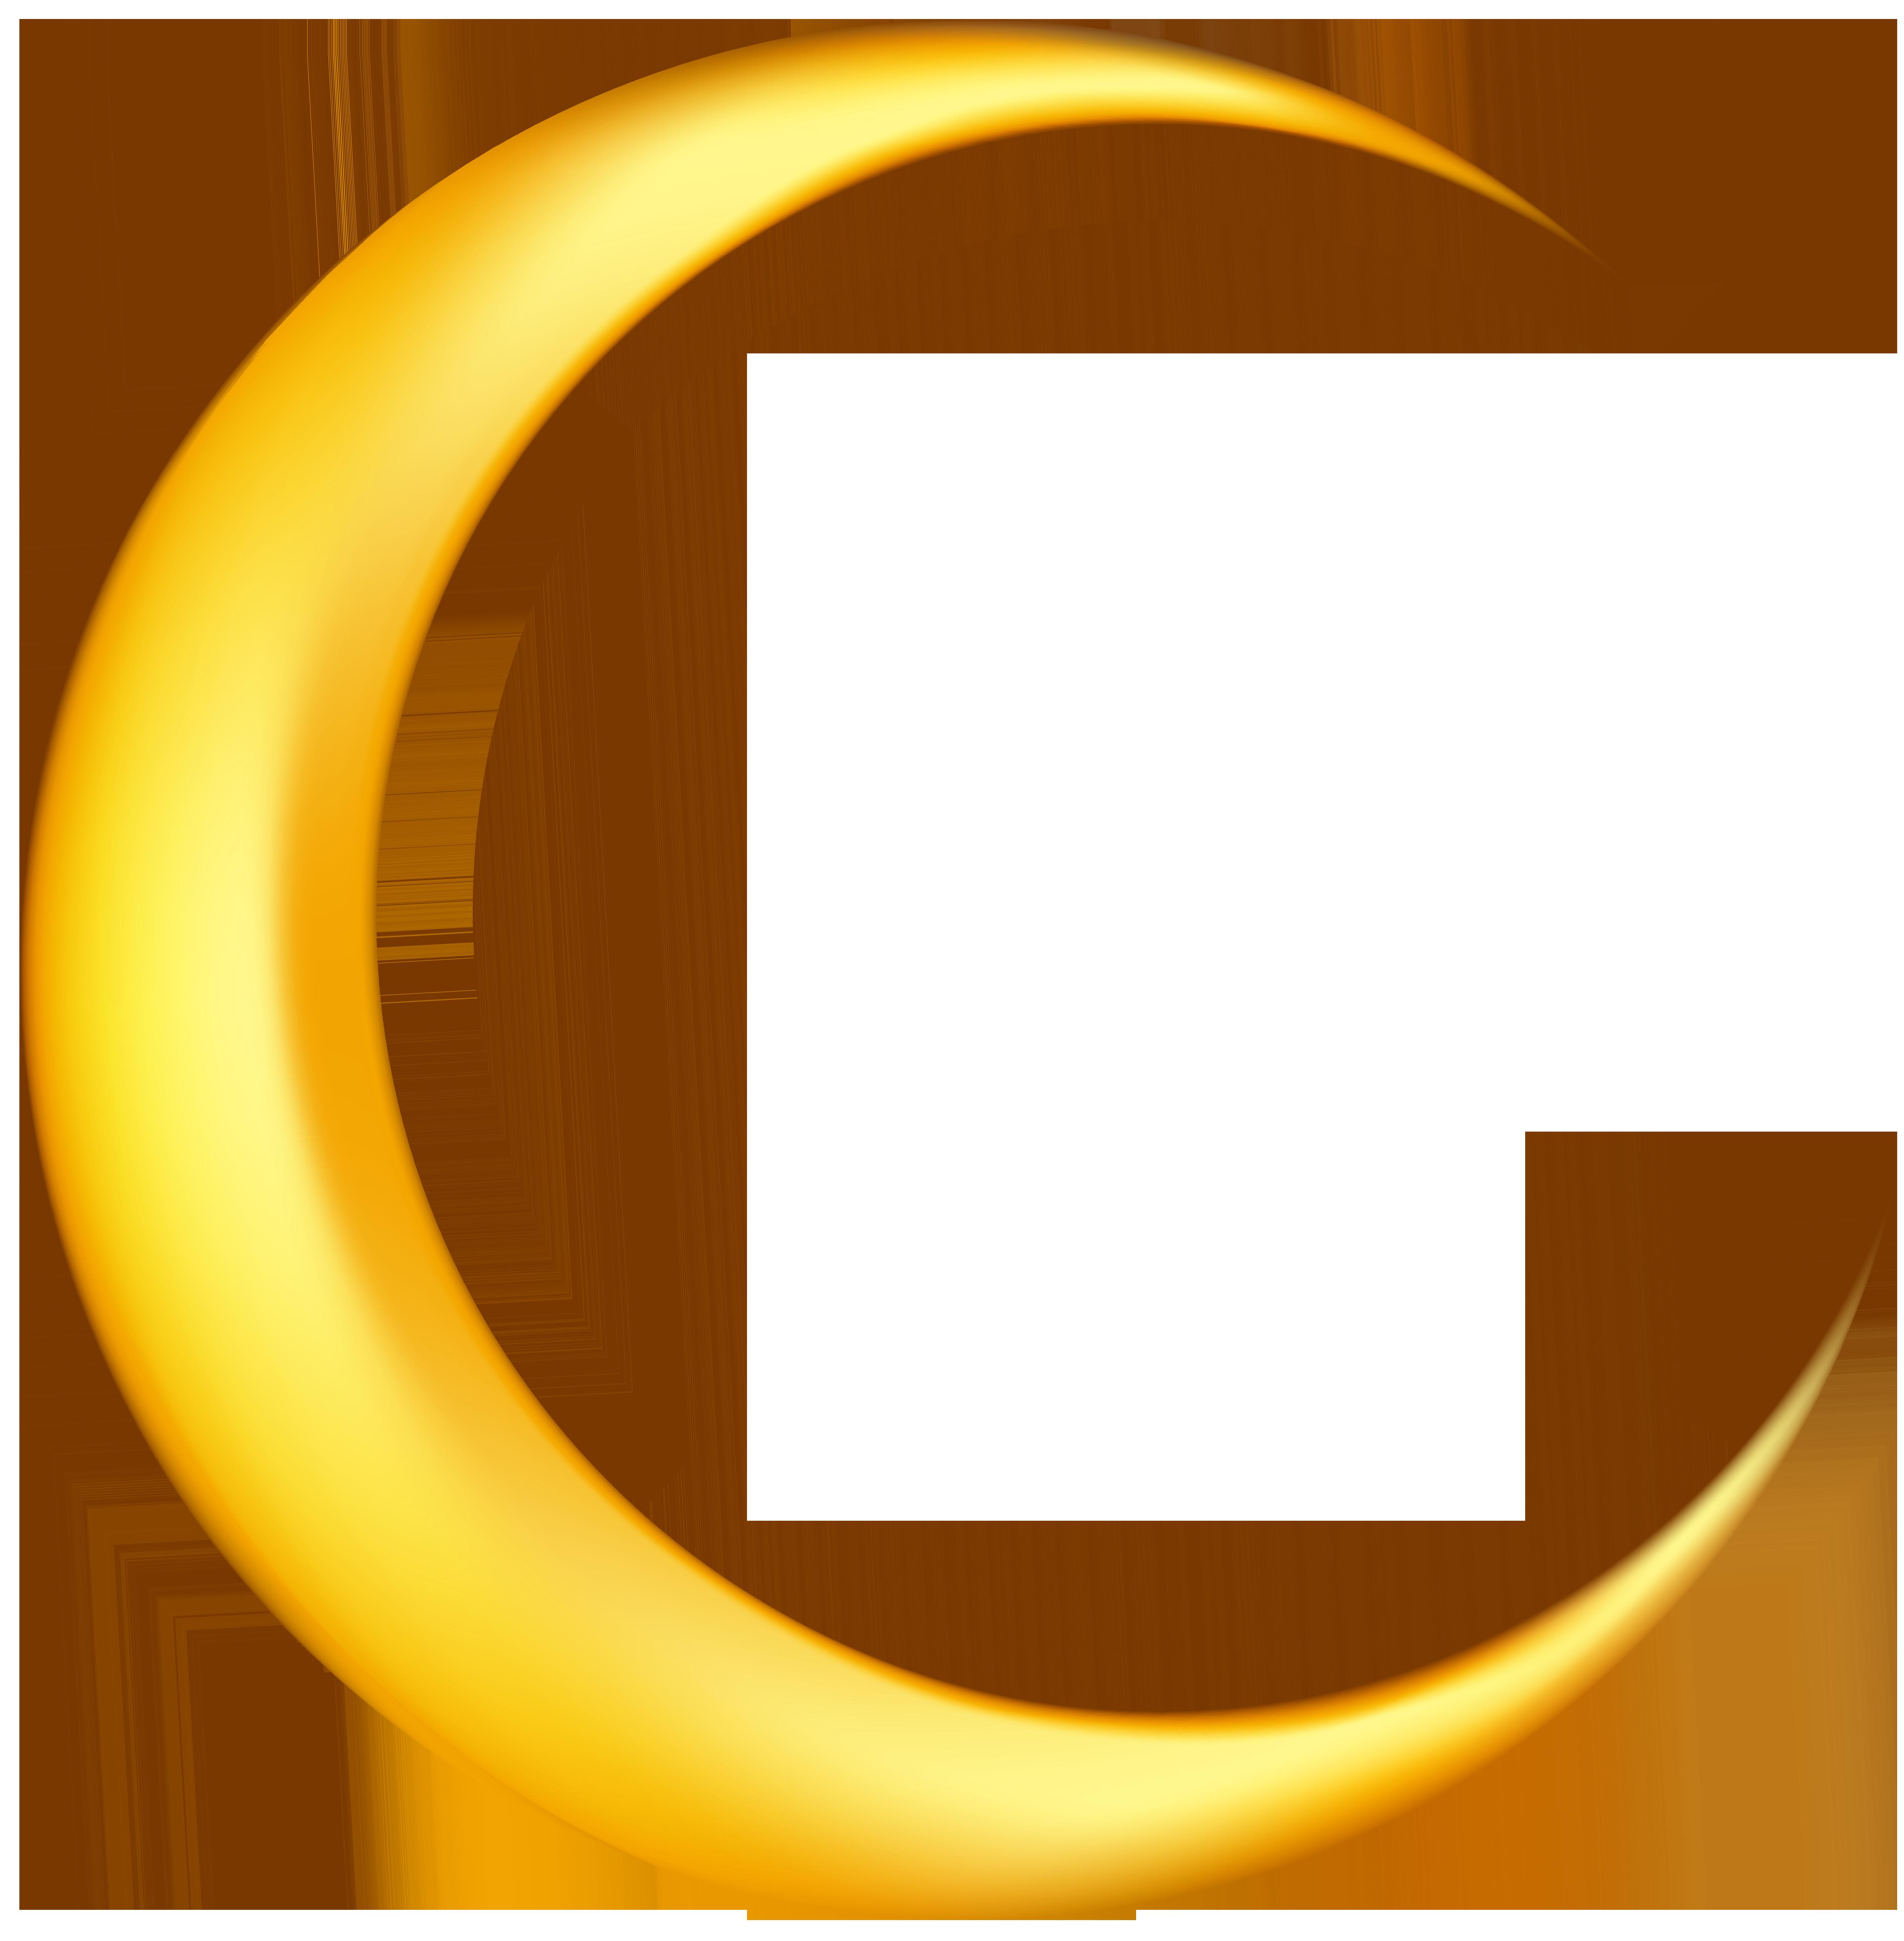 5011x5108 Yellow New Moon Clip Art Image